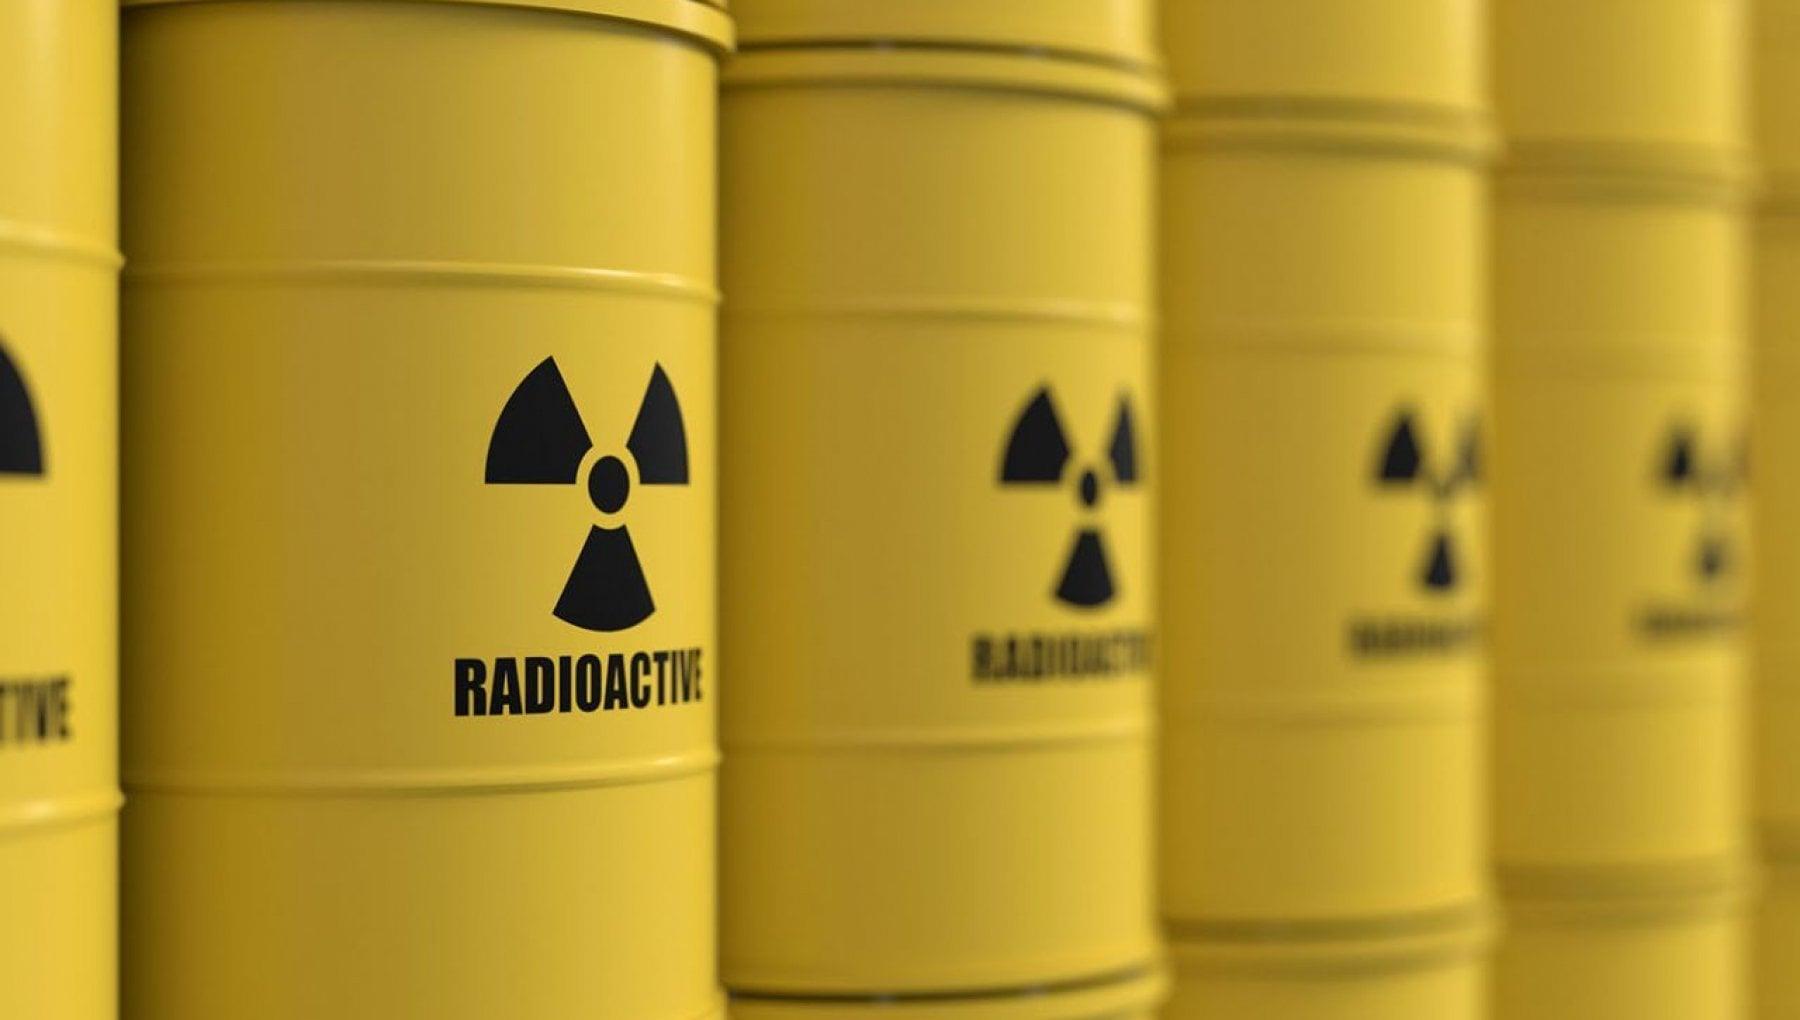 092059838 9614f66c 66bb 426a b1ef d4ab57129608 - Nucleare, scelte le 67 aree idonee per il deposito dei rifiuti radioattivi italiani